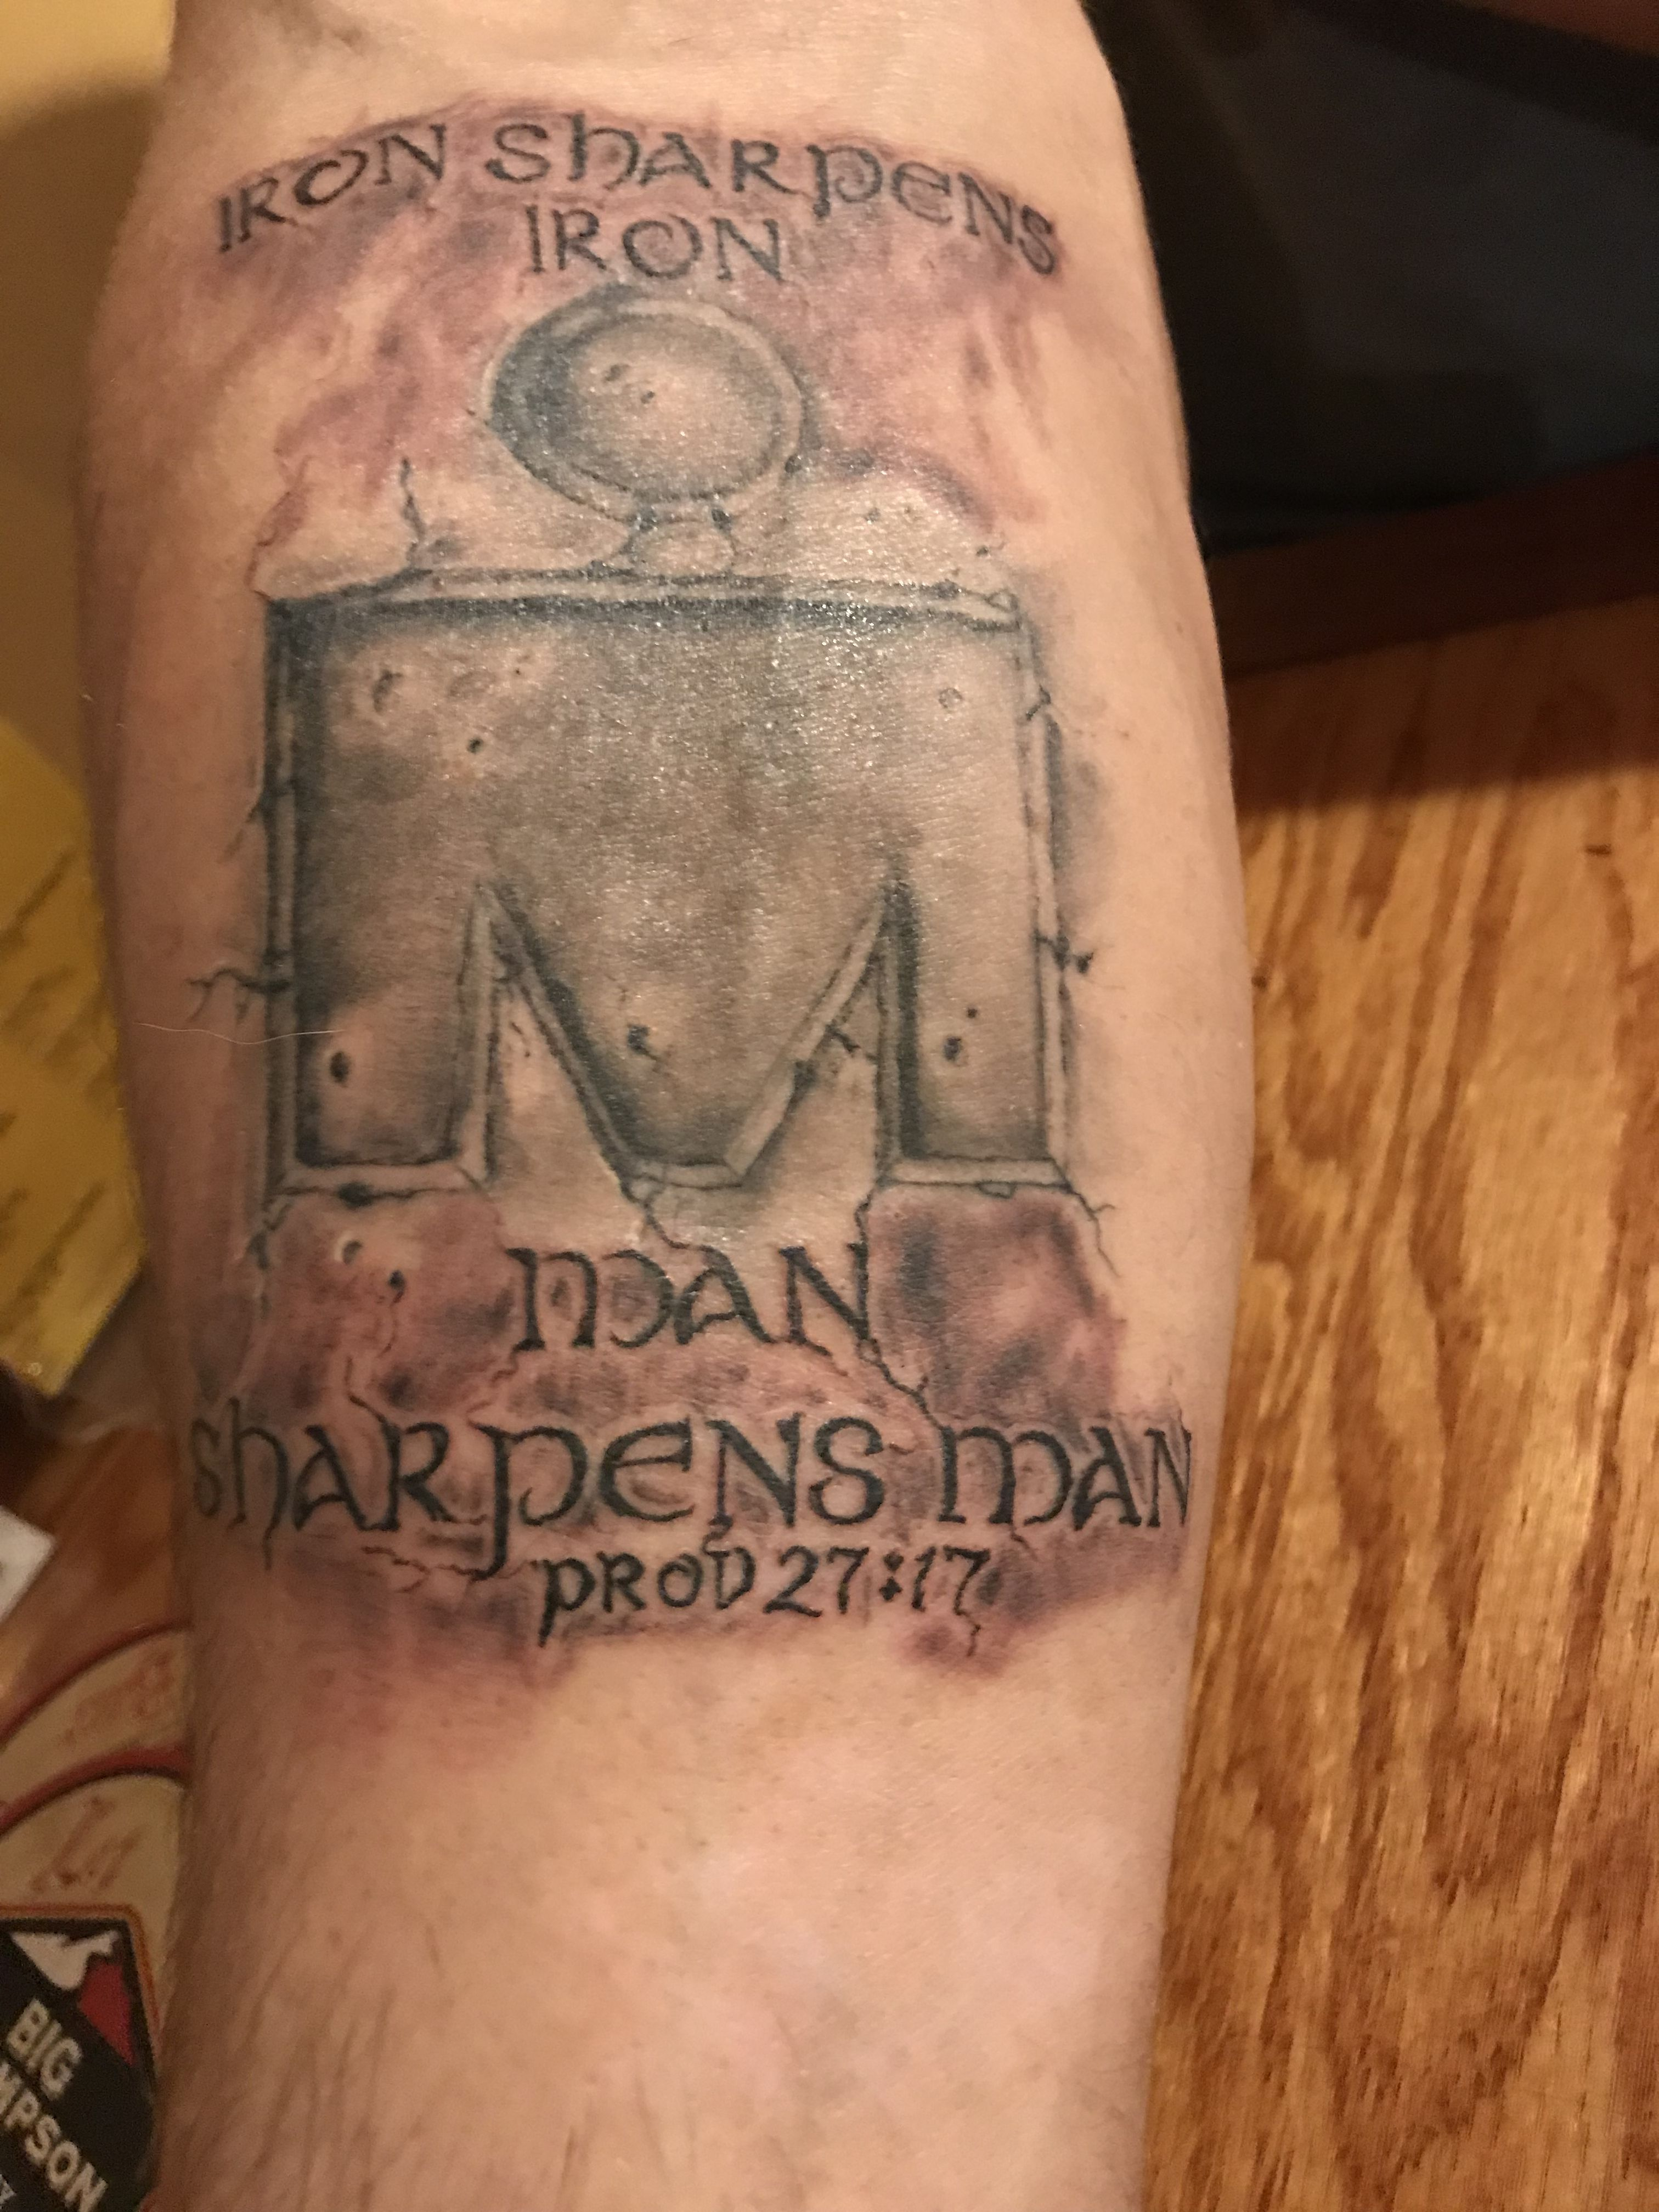 Ironman Tattoo Iron Sharpens Iron Iron Man Tattoo Tattoos Tattoos For Guys